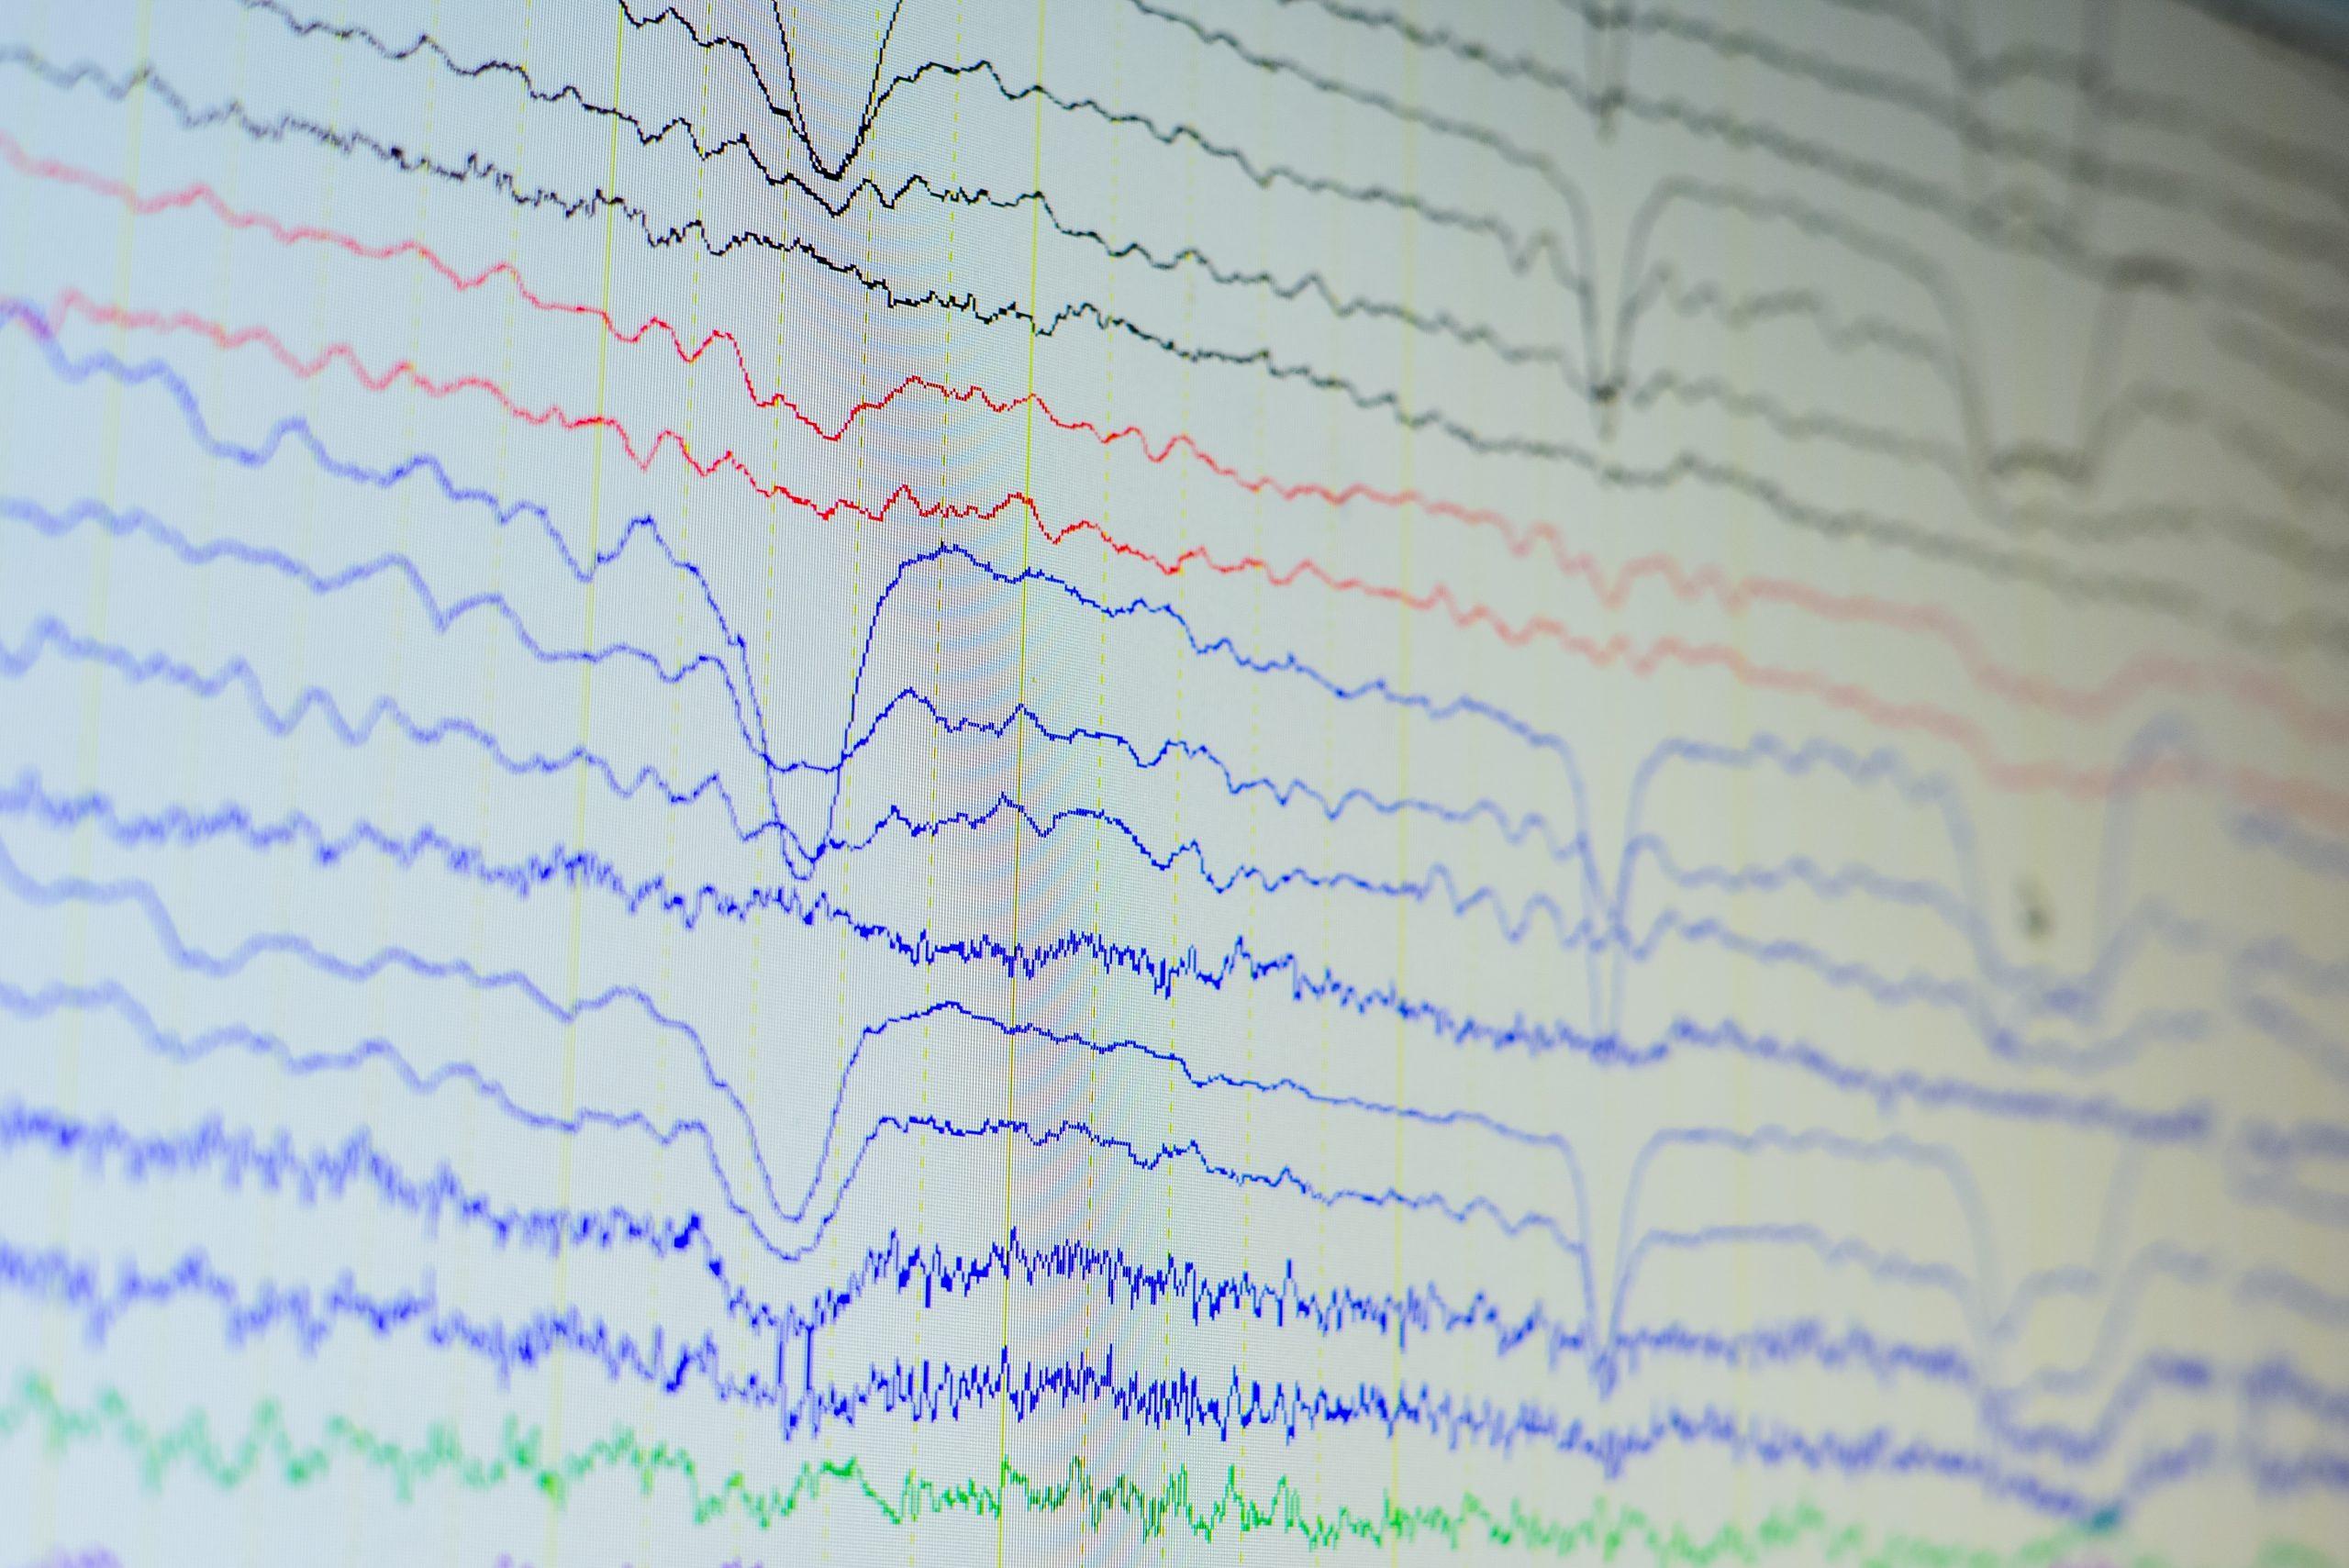 EEG recordings